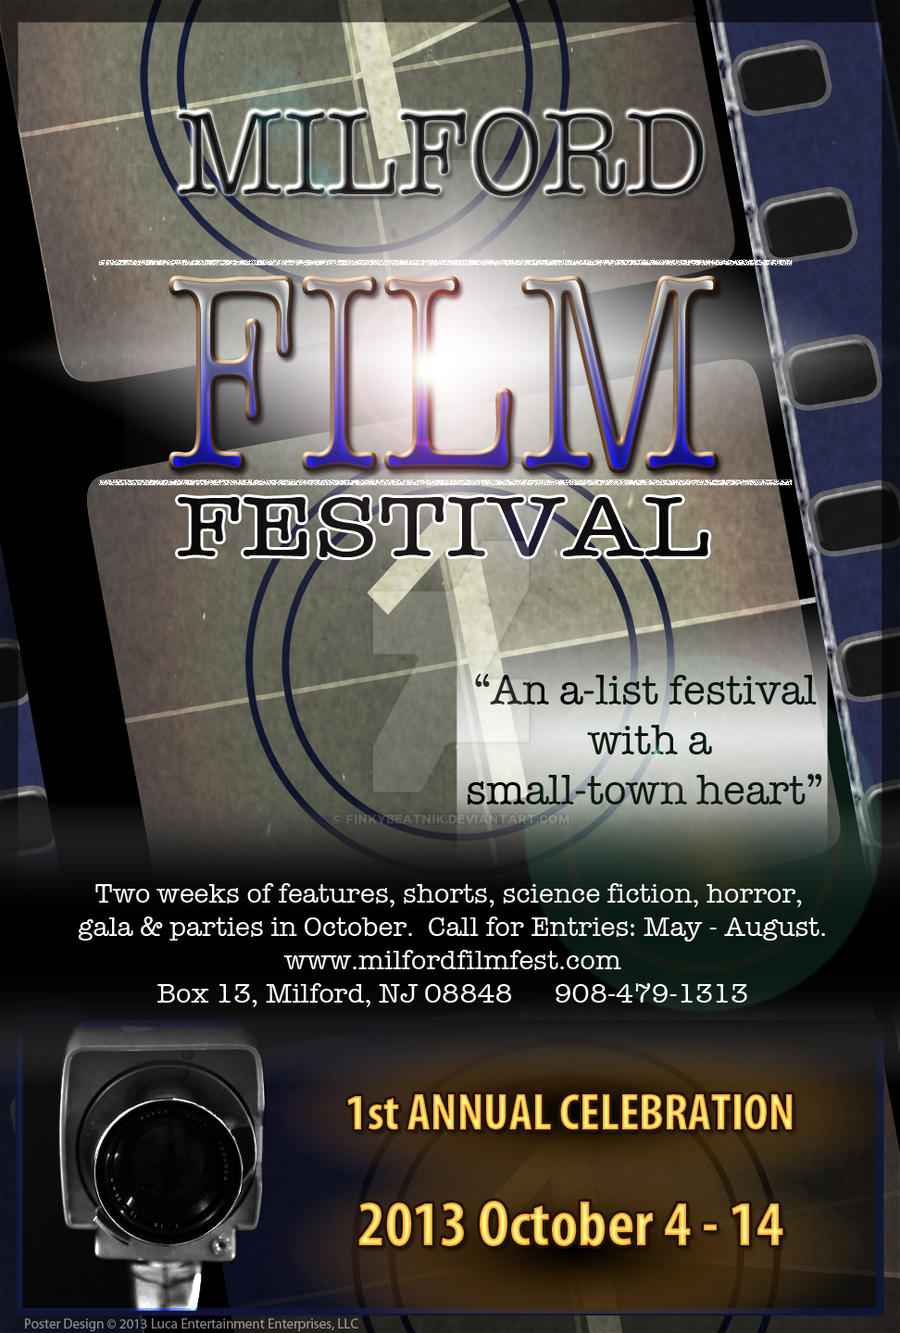 Milford Film Festival Poster by finkybeatnik